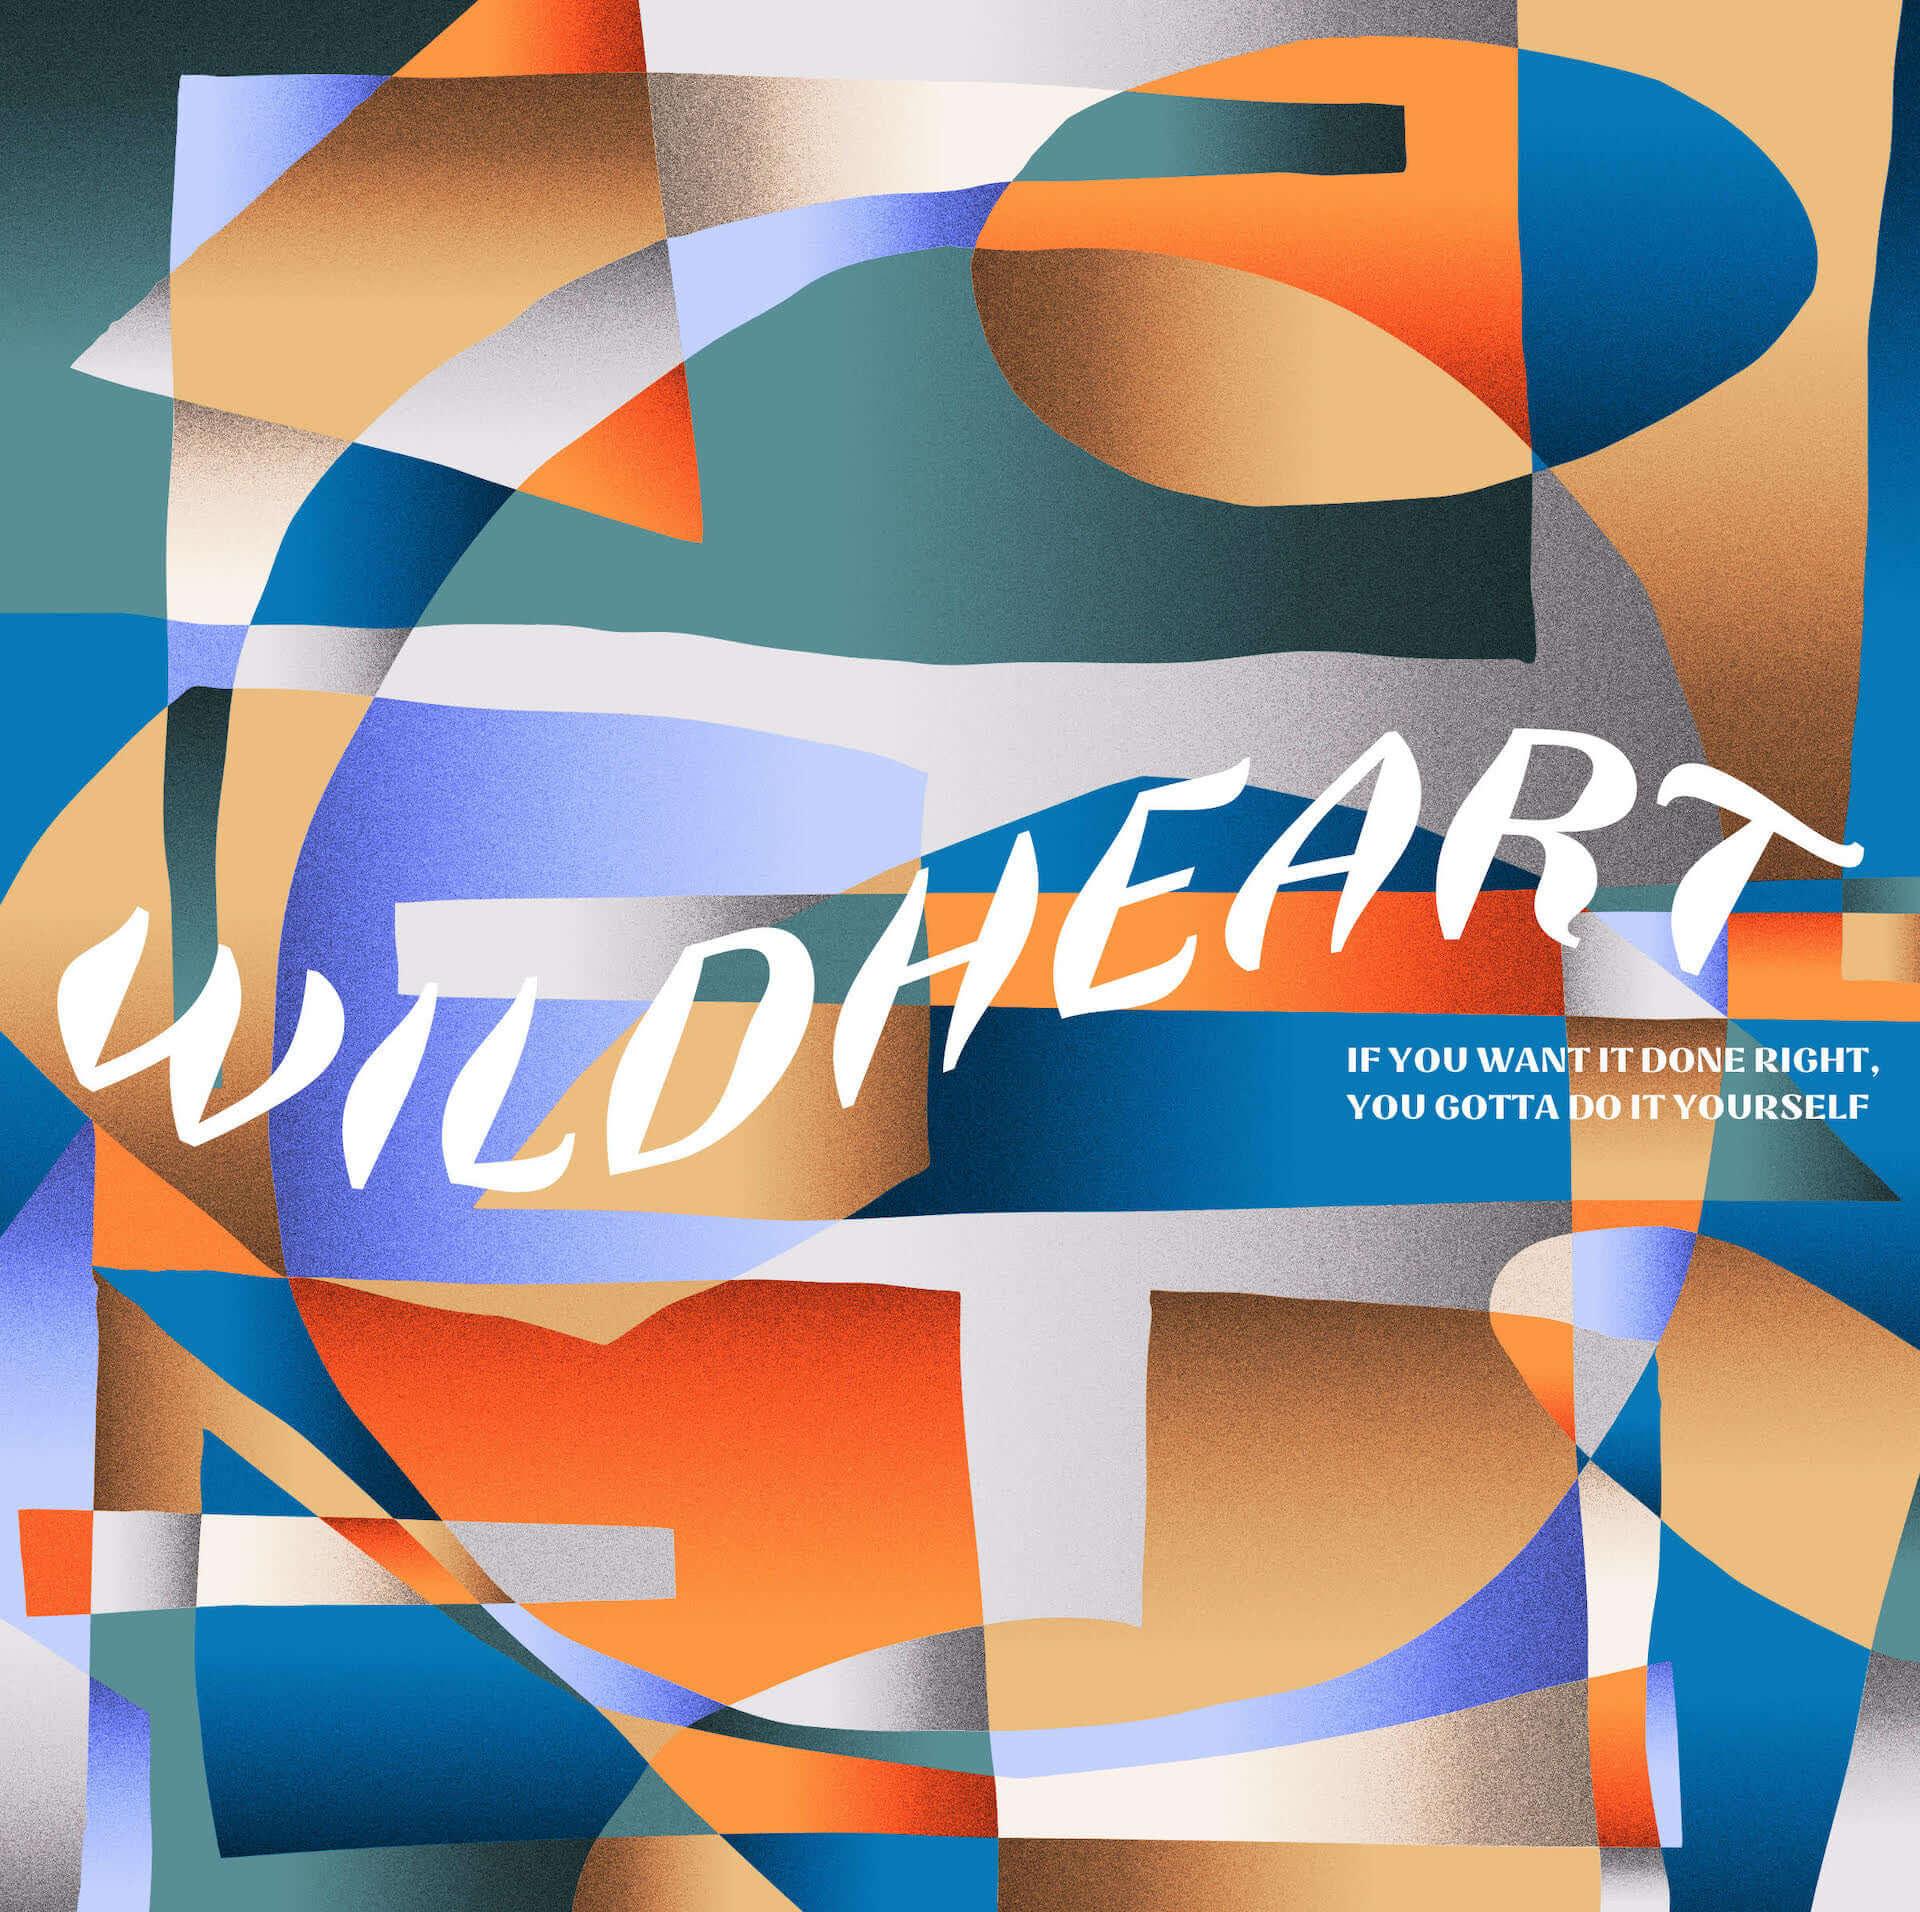 Midori Aoyamaが渋谷Contactで新パーティ<WILDHEART>を始動!Soichi Terada、Toshio Matsuuraらが出演 music201005_contact-wildheart-_2-1920x1912